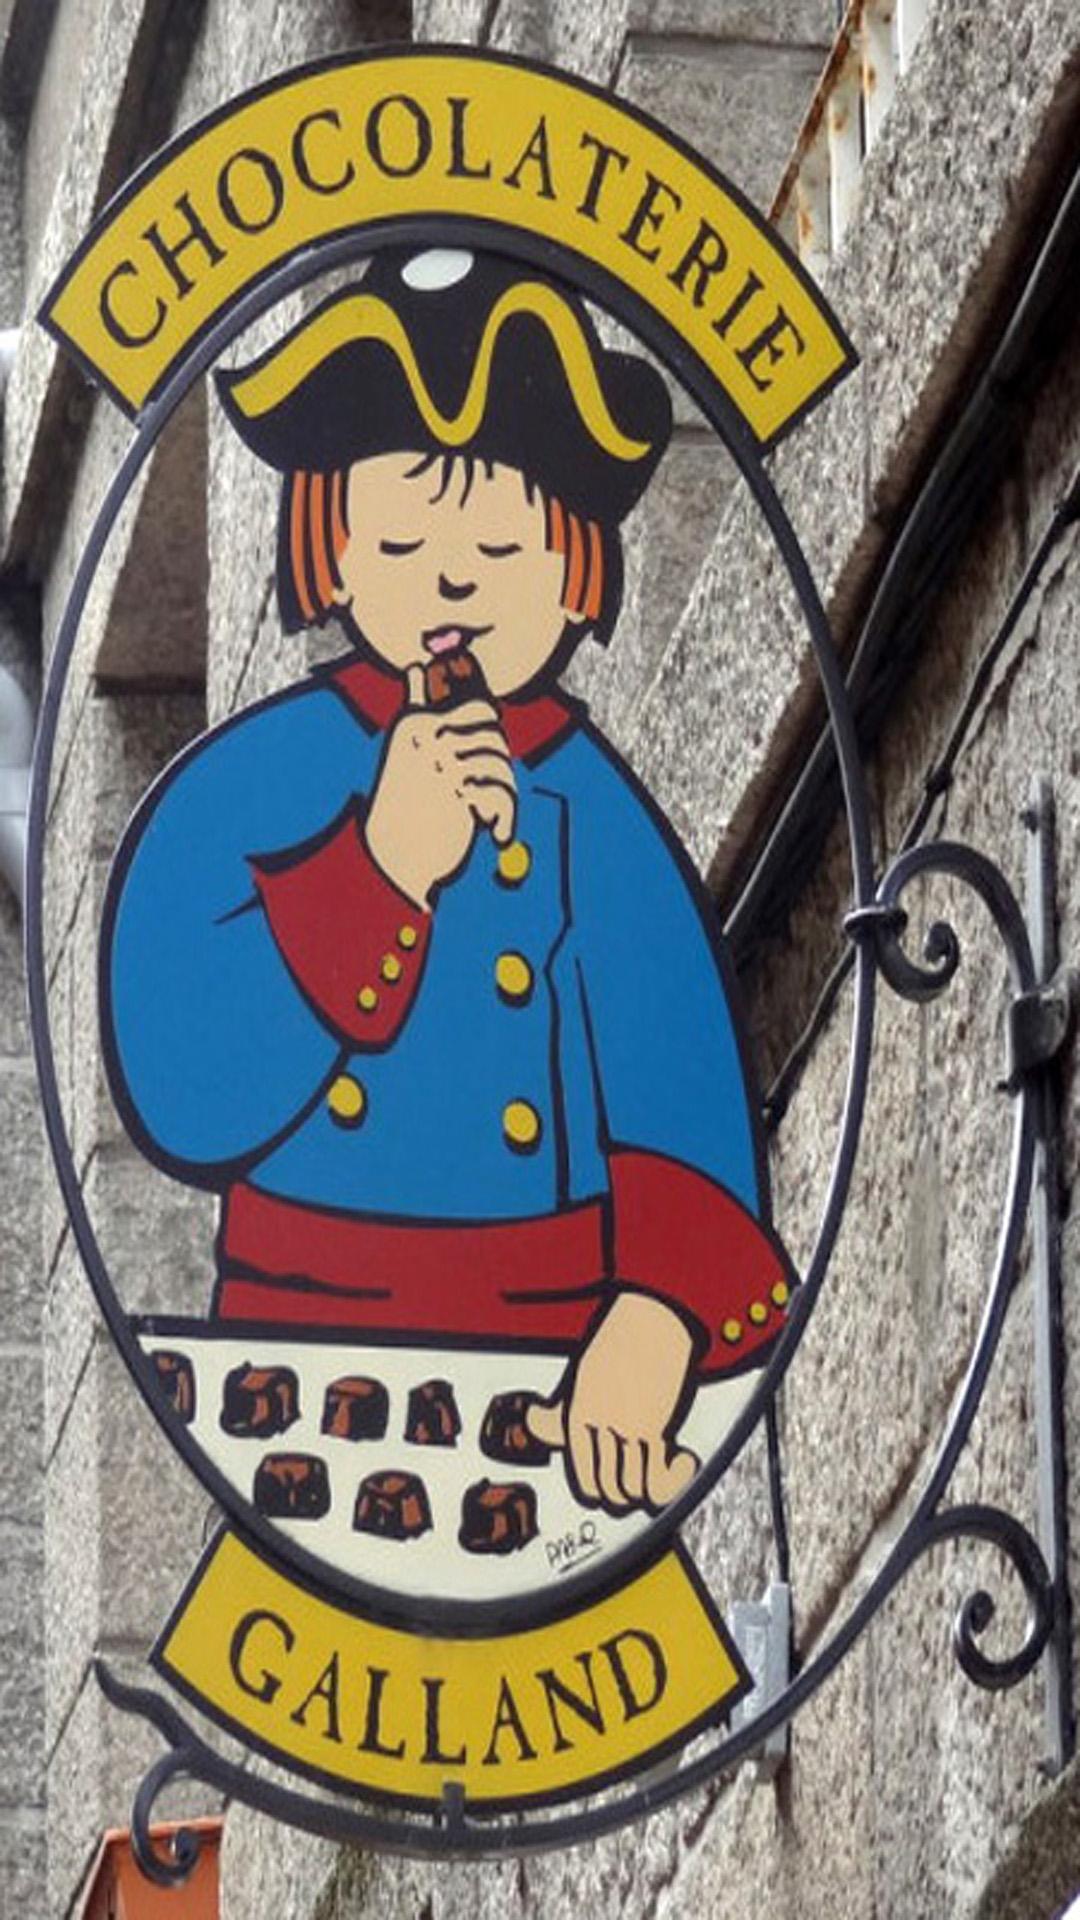 Chocolaterie Galand